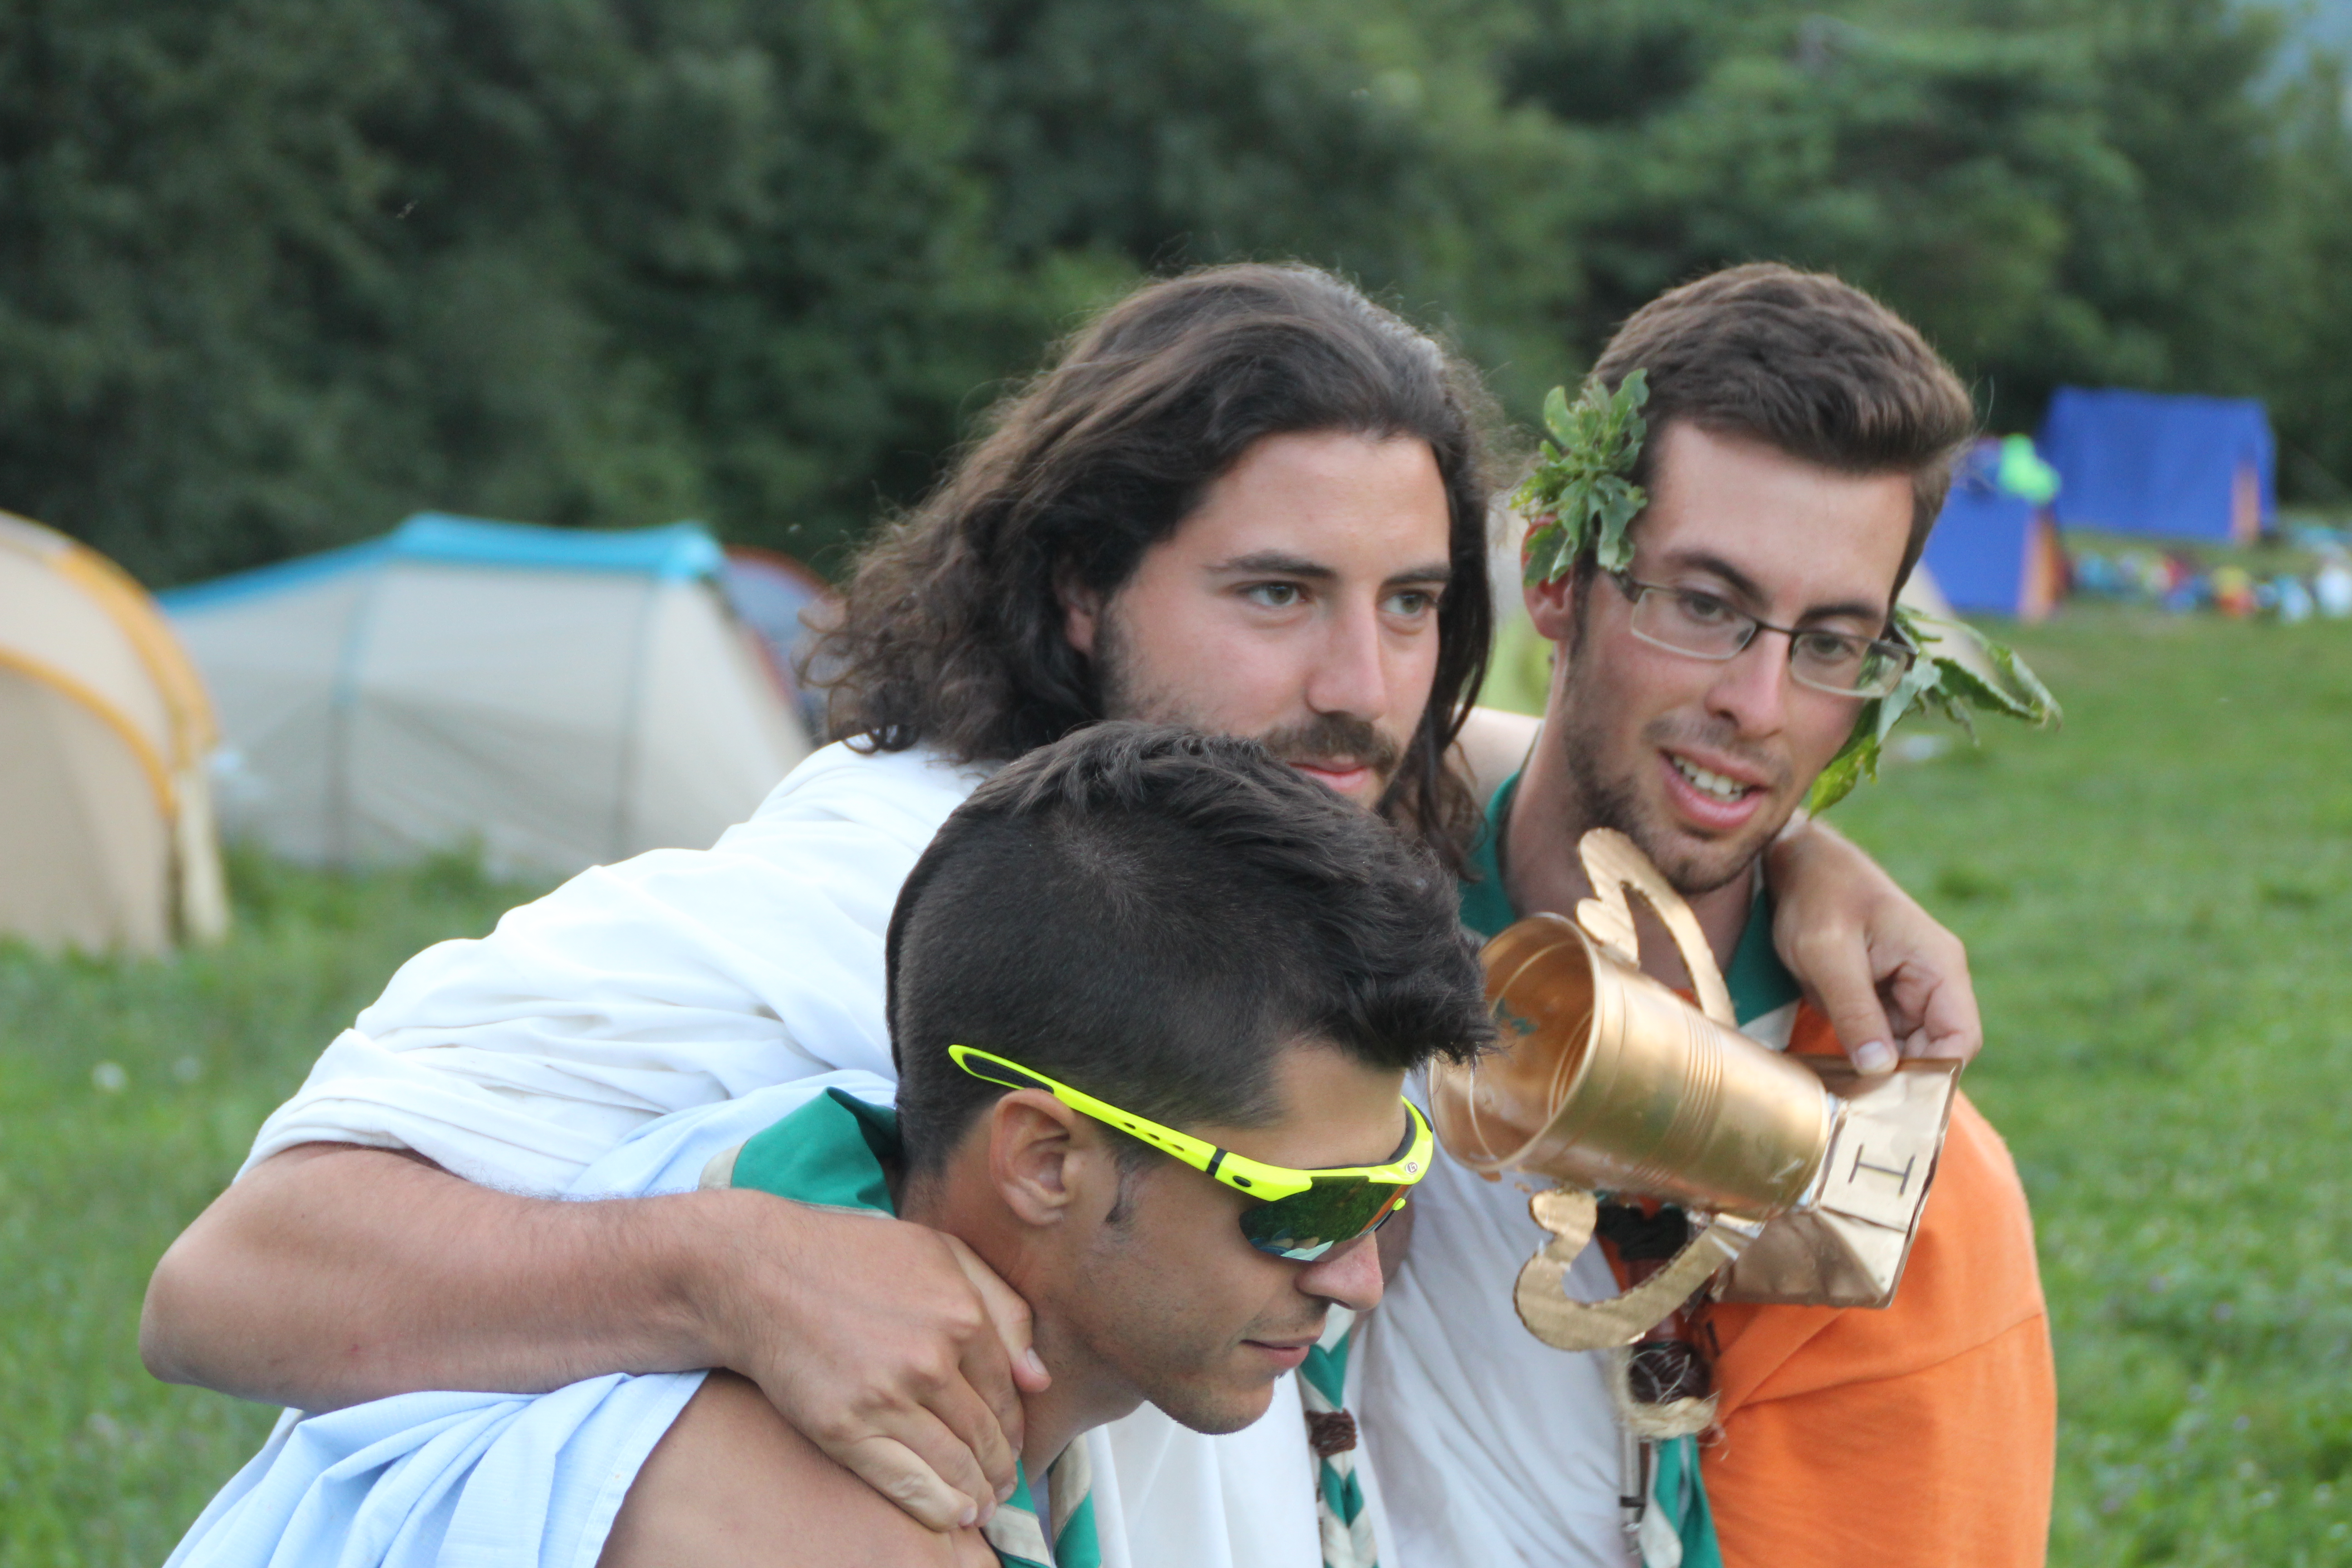 15-16 - Grupo - Campamento de verano - P283